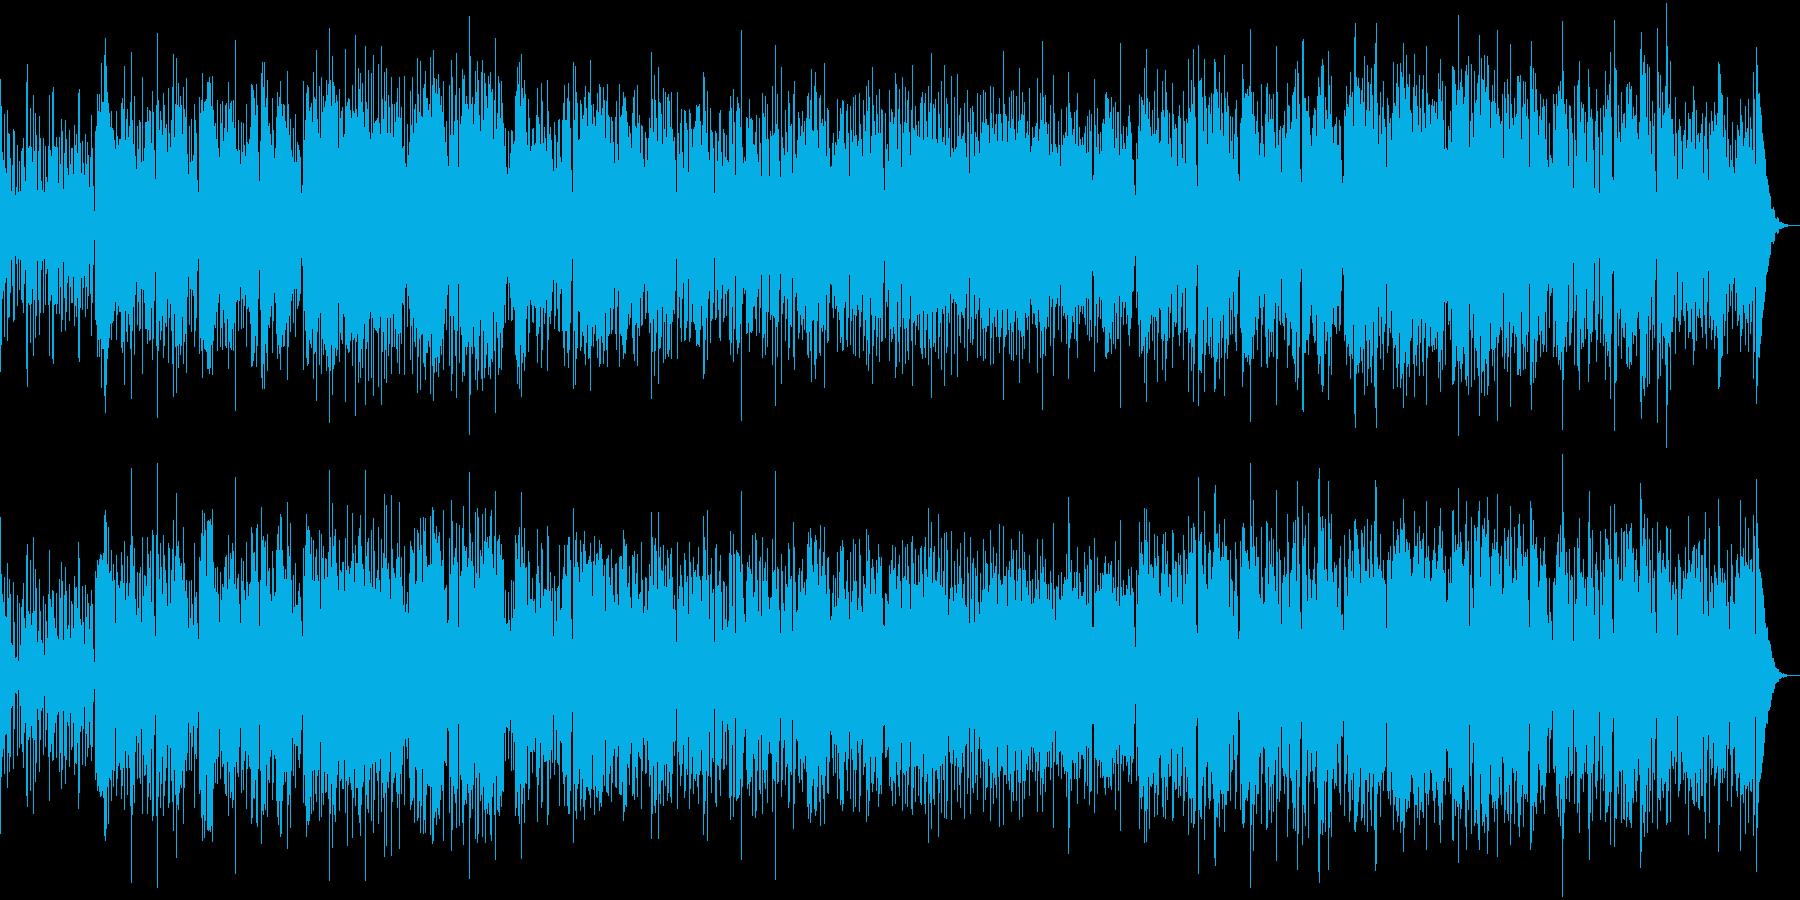 AOR感漂うお洒落ギターインストの再生済みの波形